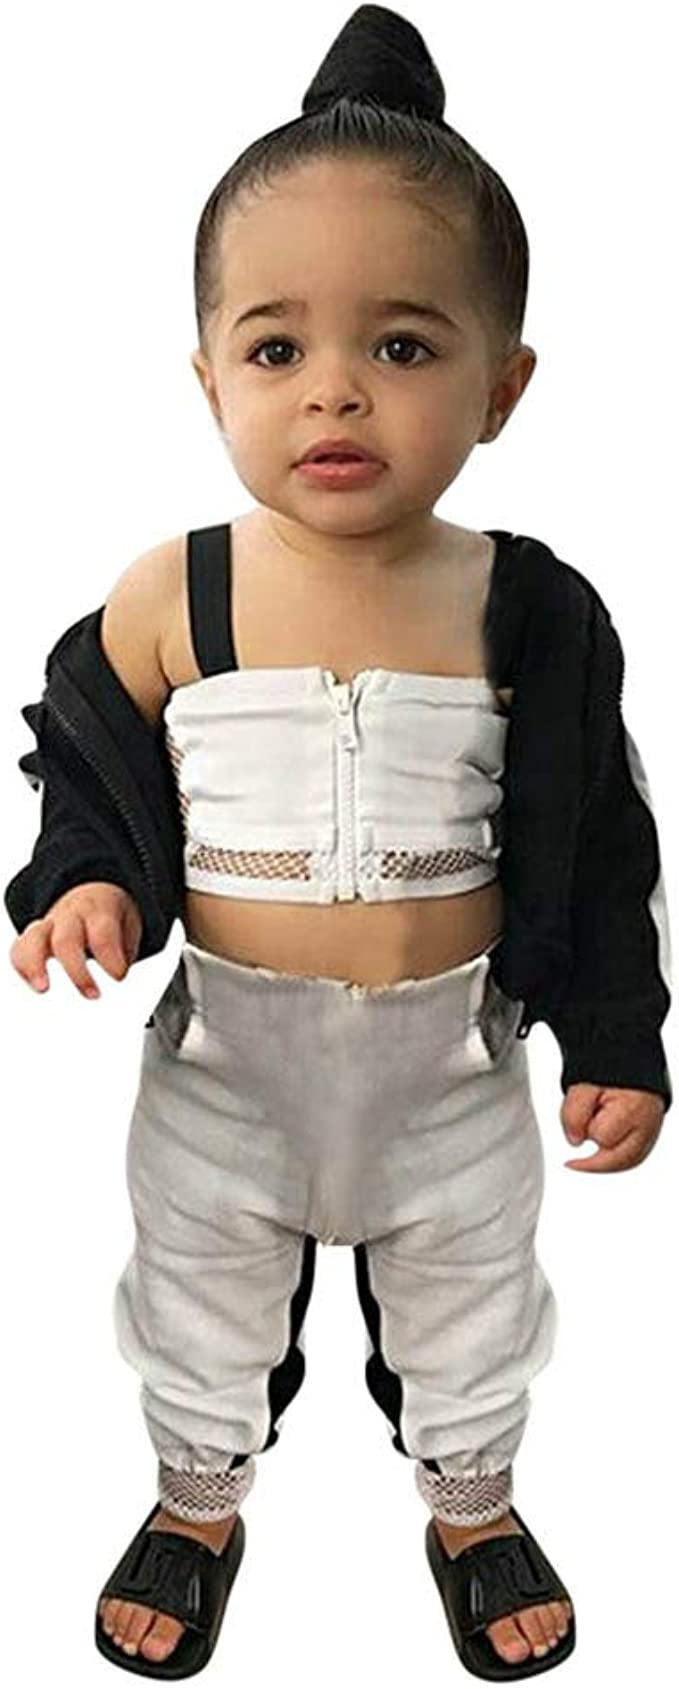 1-4 Años, SO-buts Niño Bebé Niña Niño Verano La Moda Fishnet ...